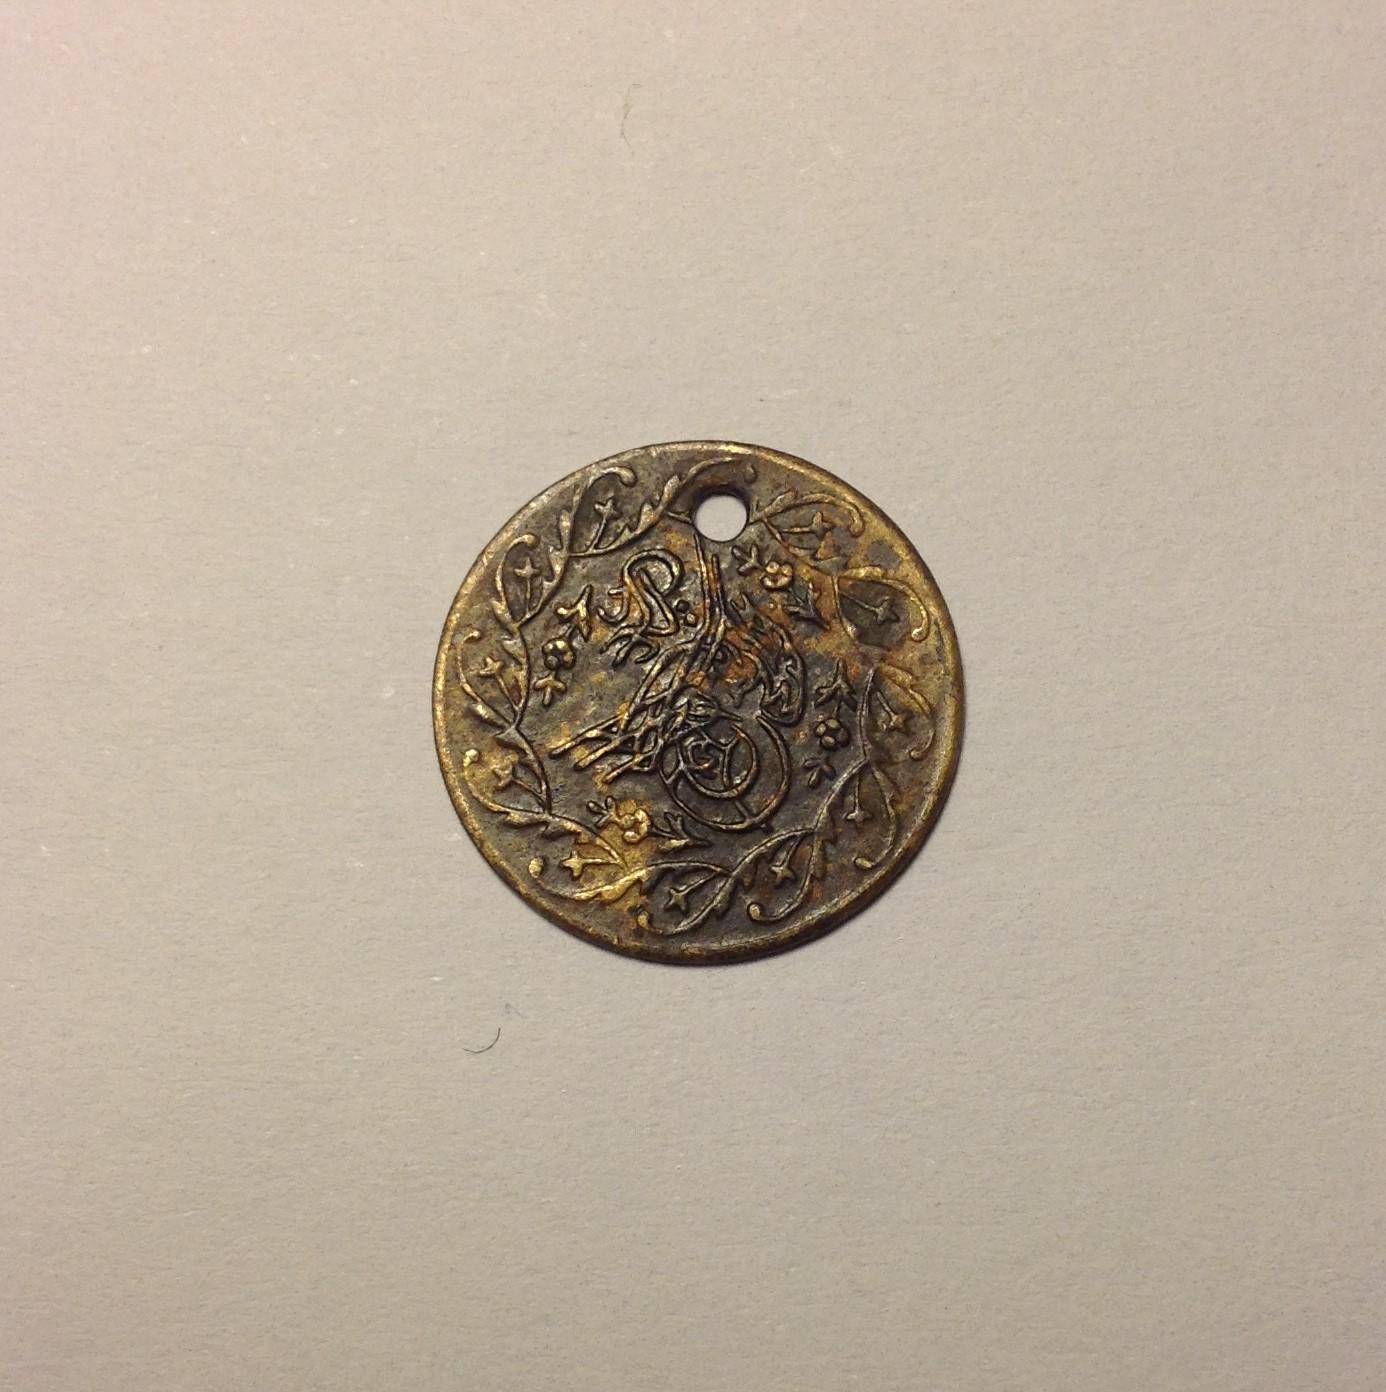 Medalla-moneda árabe a identificar 33die5g